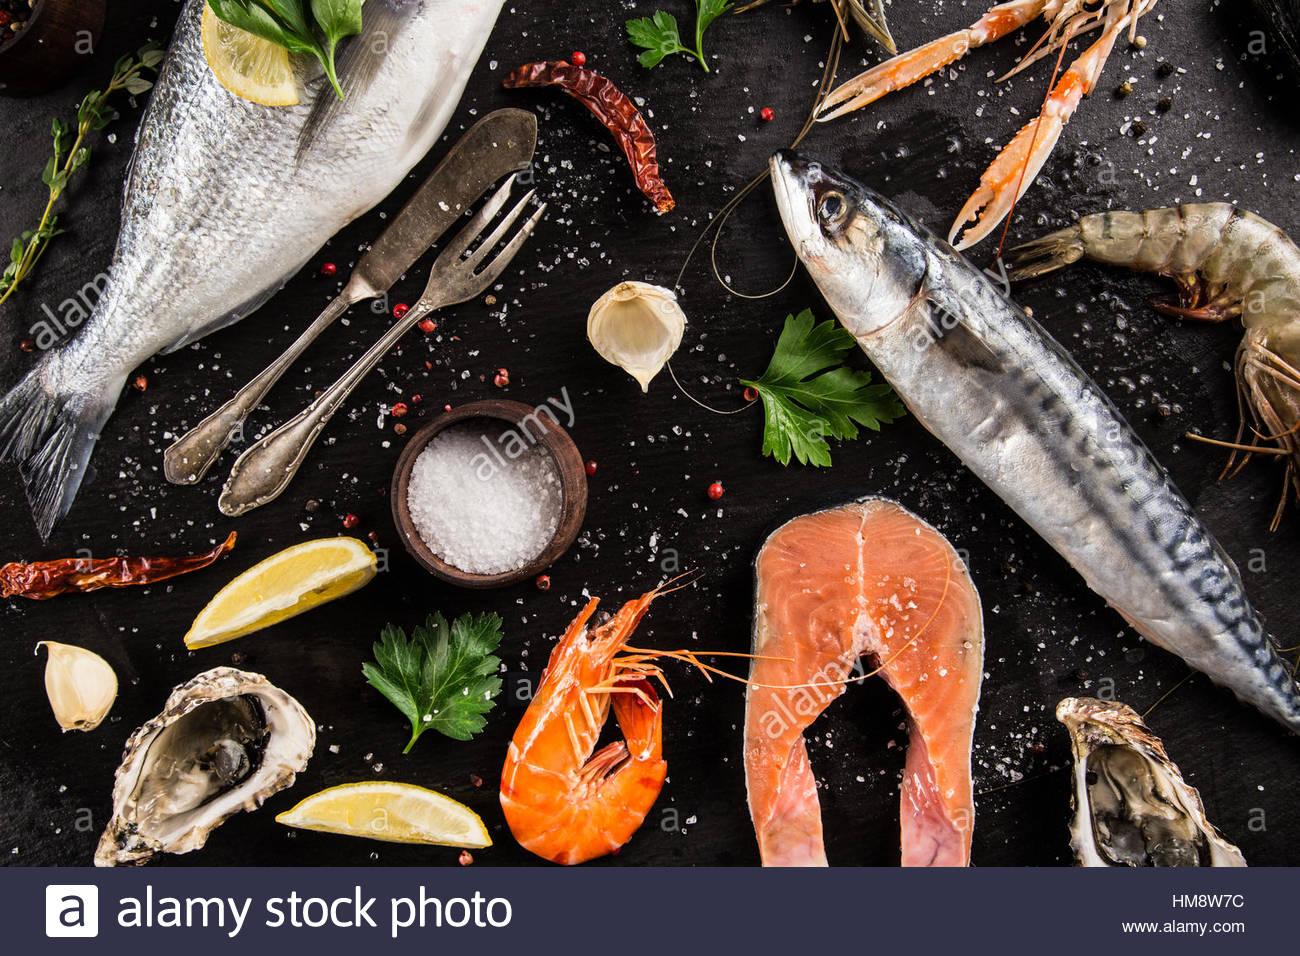 Fresh seafood on black stone, close-up. - Stock Image